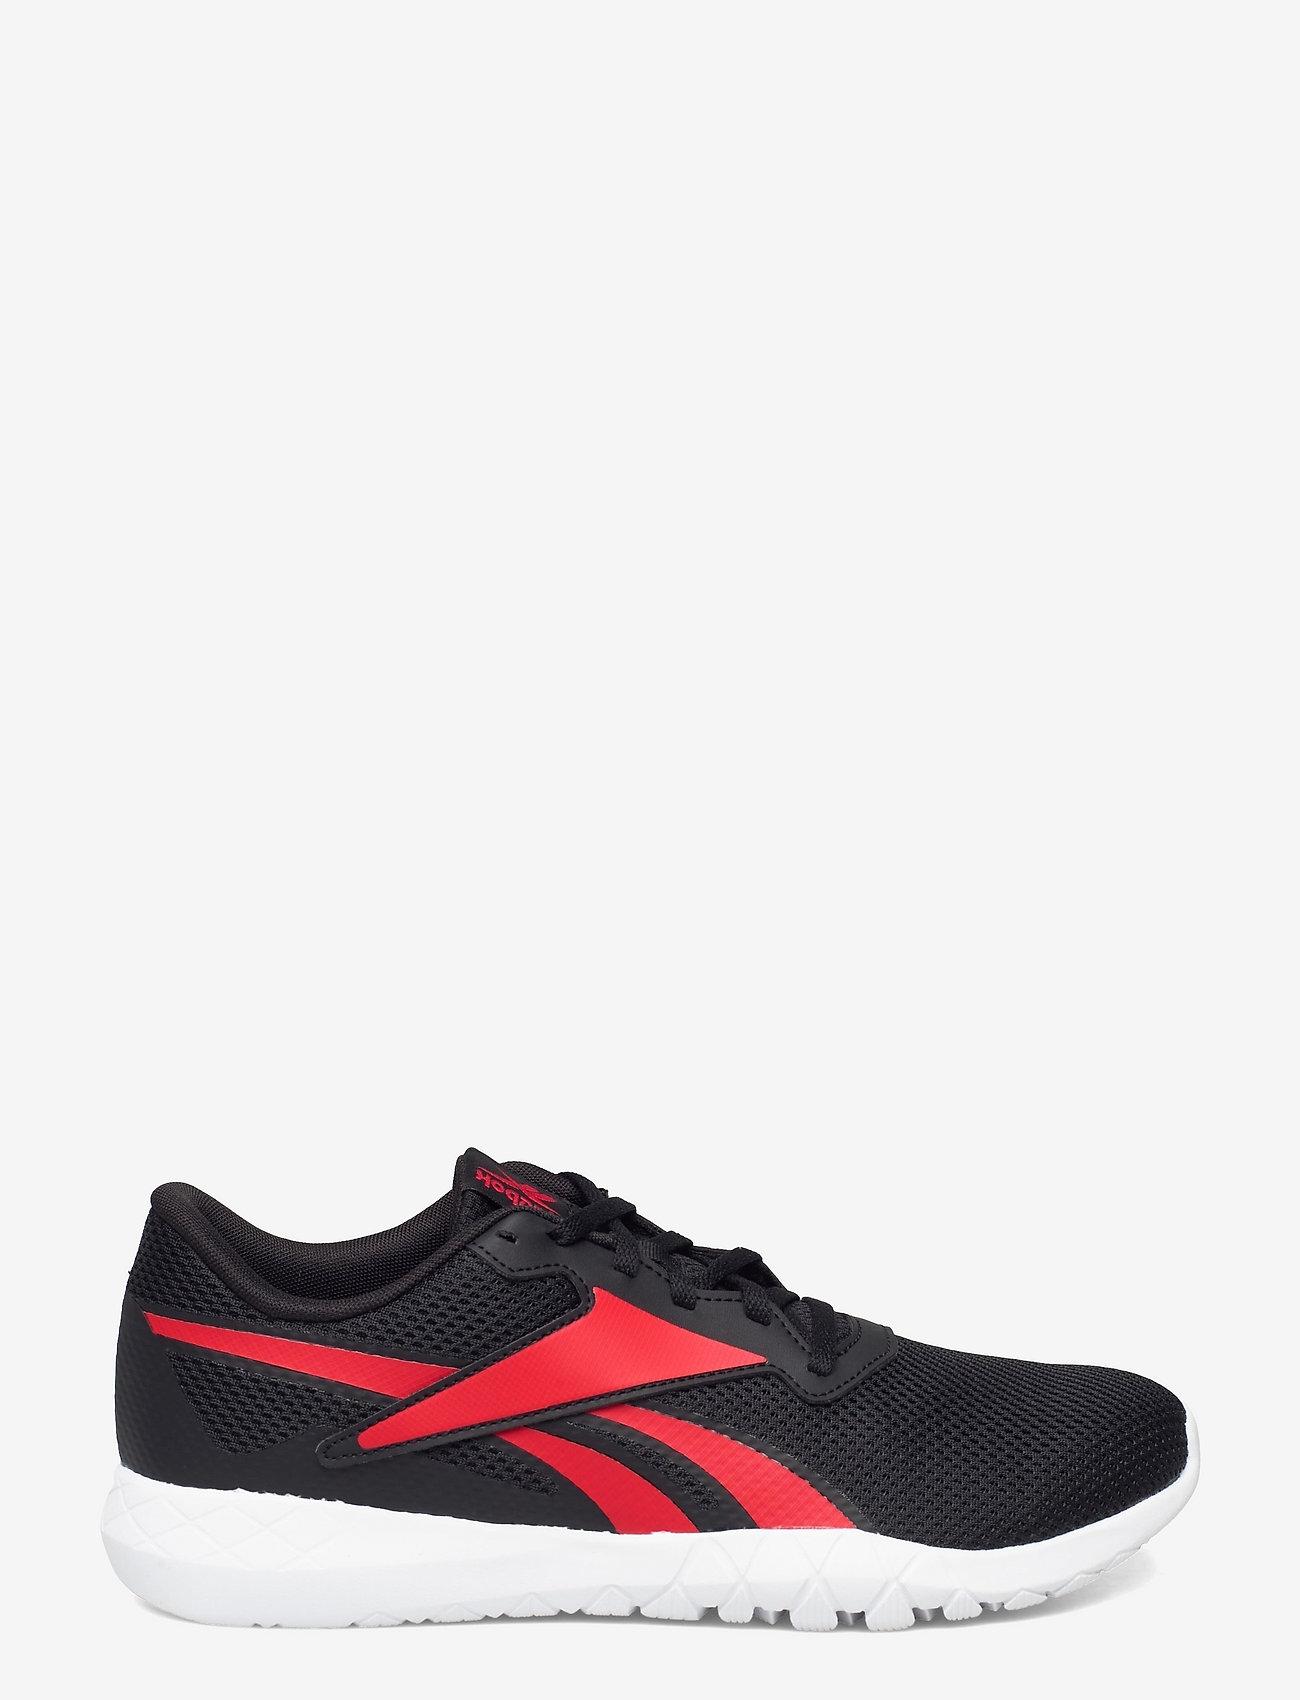 Reebok Performance - FLEXAGON ENERGY TR 3.0 - training schoenen - cblack/vecred/ftwwht - 1